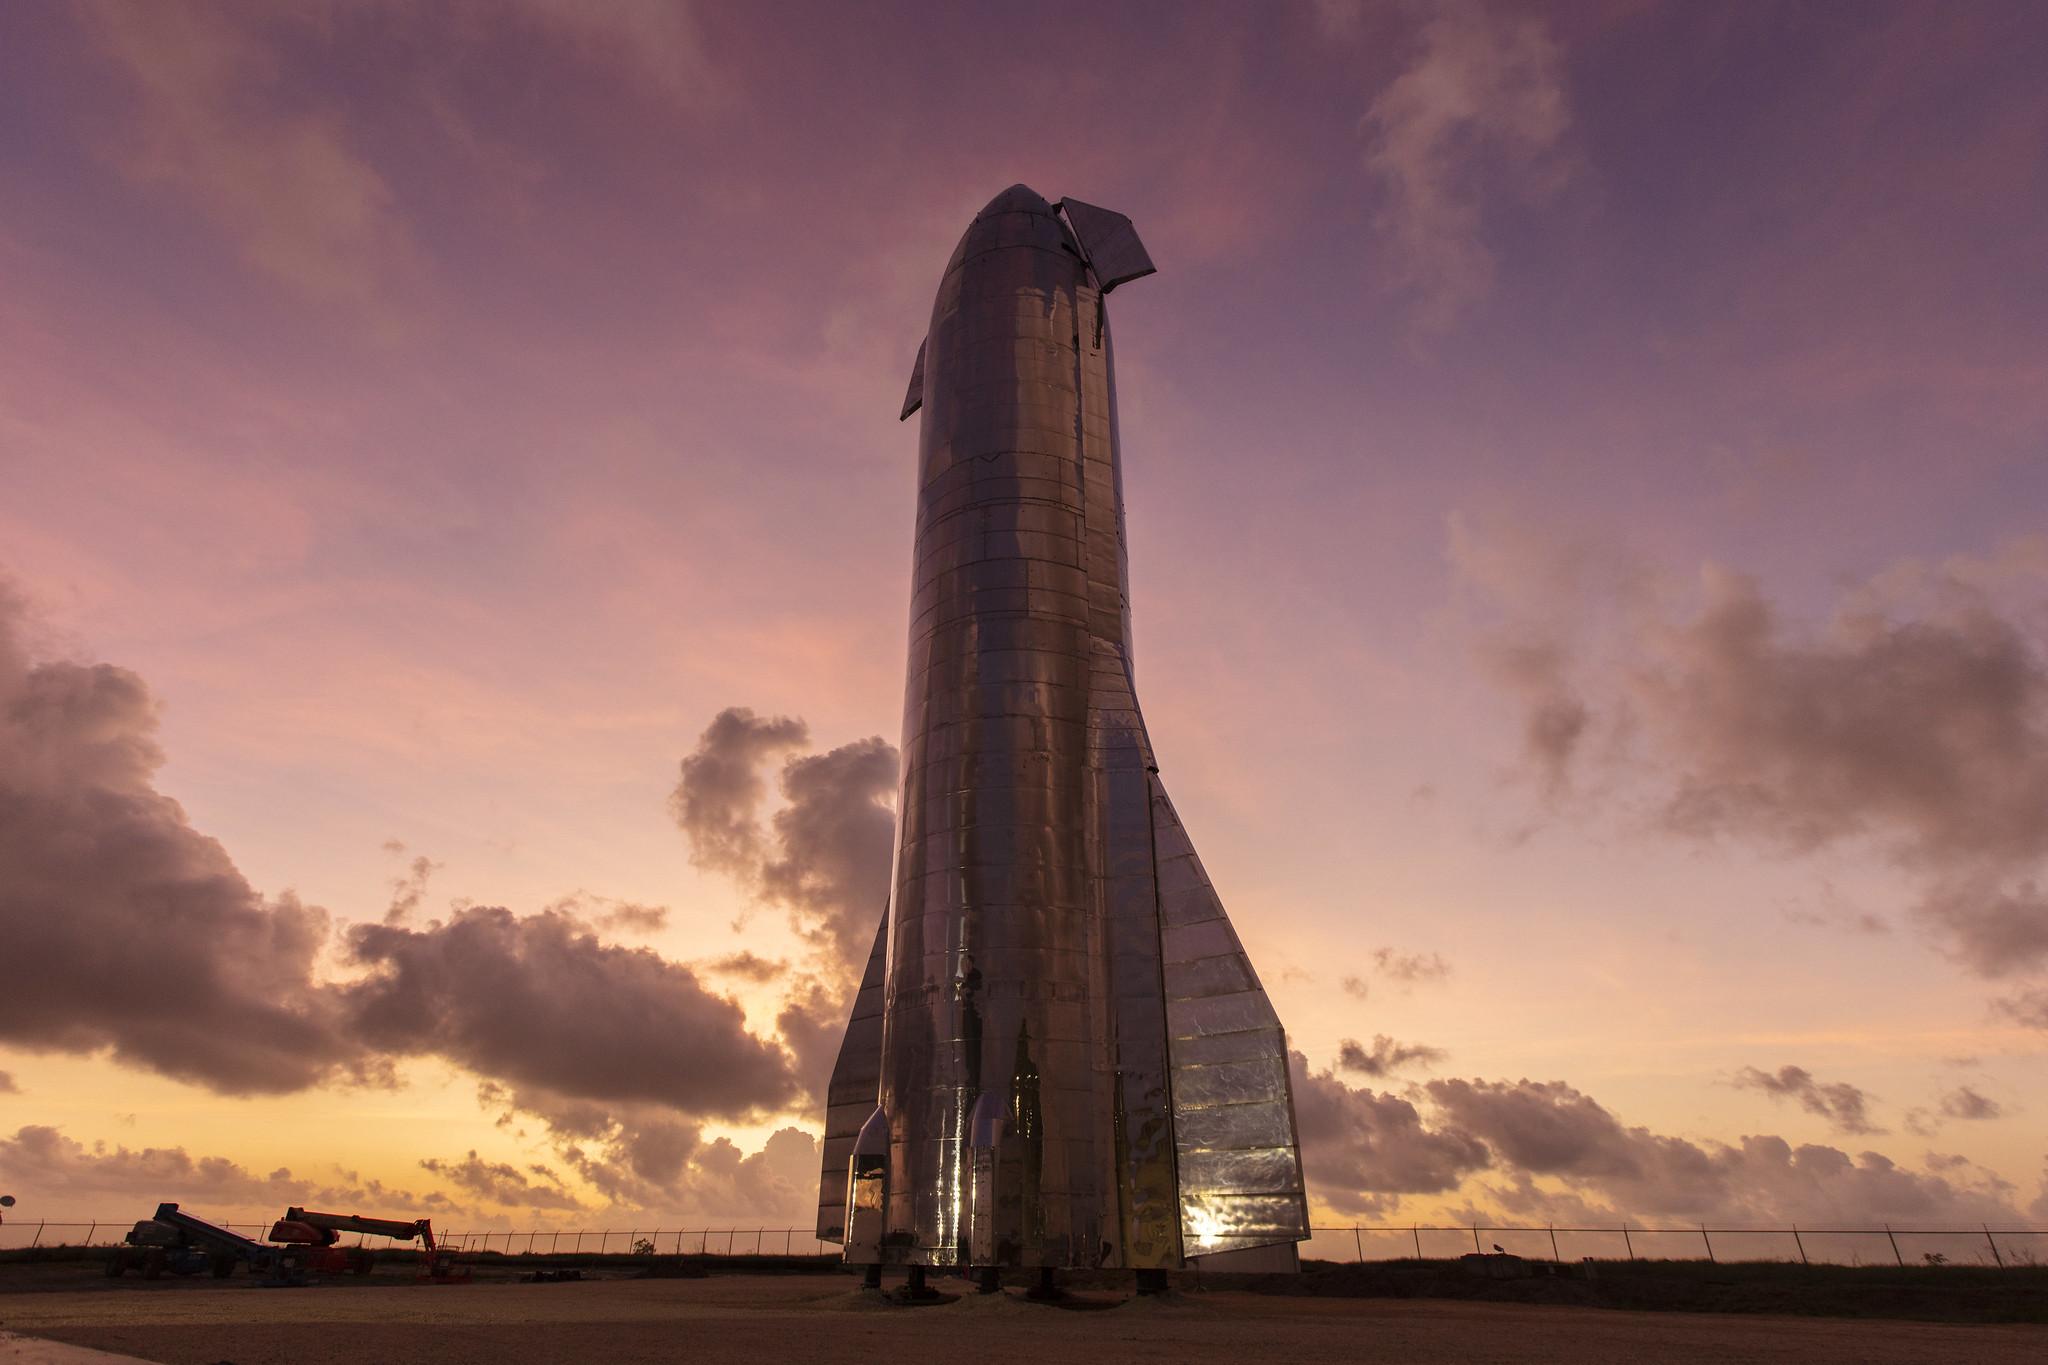 Прототип корабля SpaceX для полётов на Марс взорвался после успешного тестового полёта